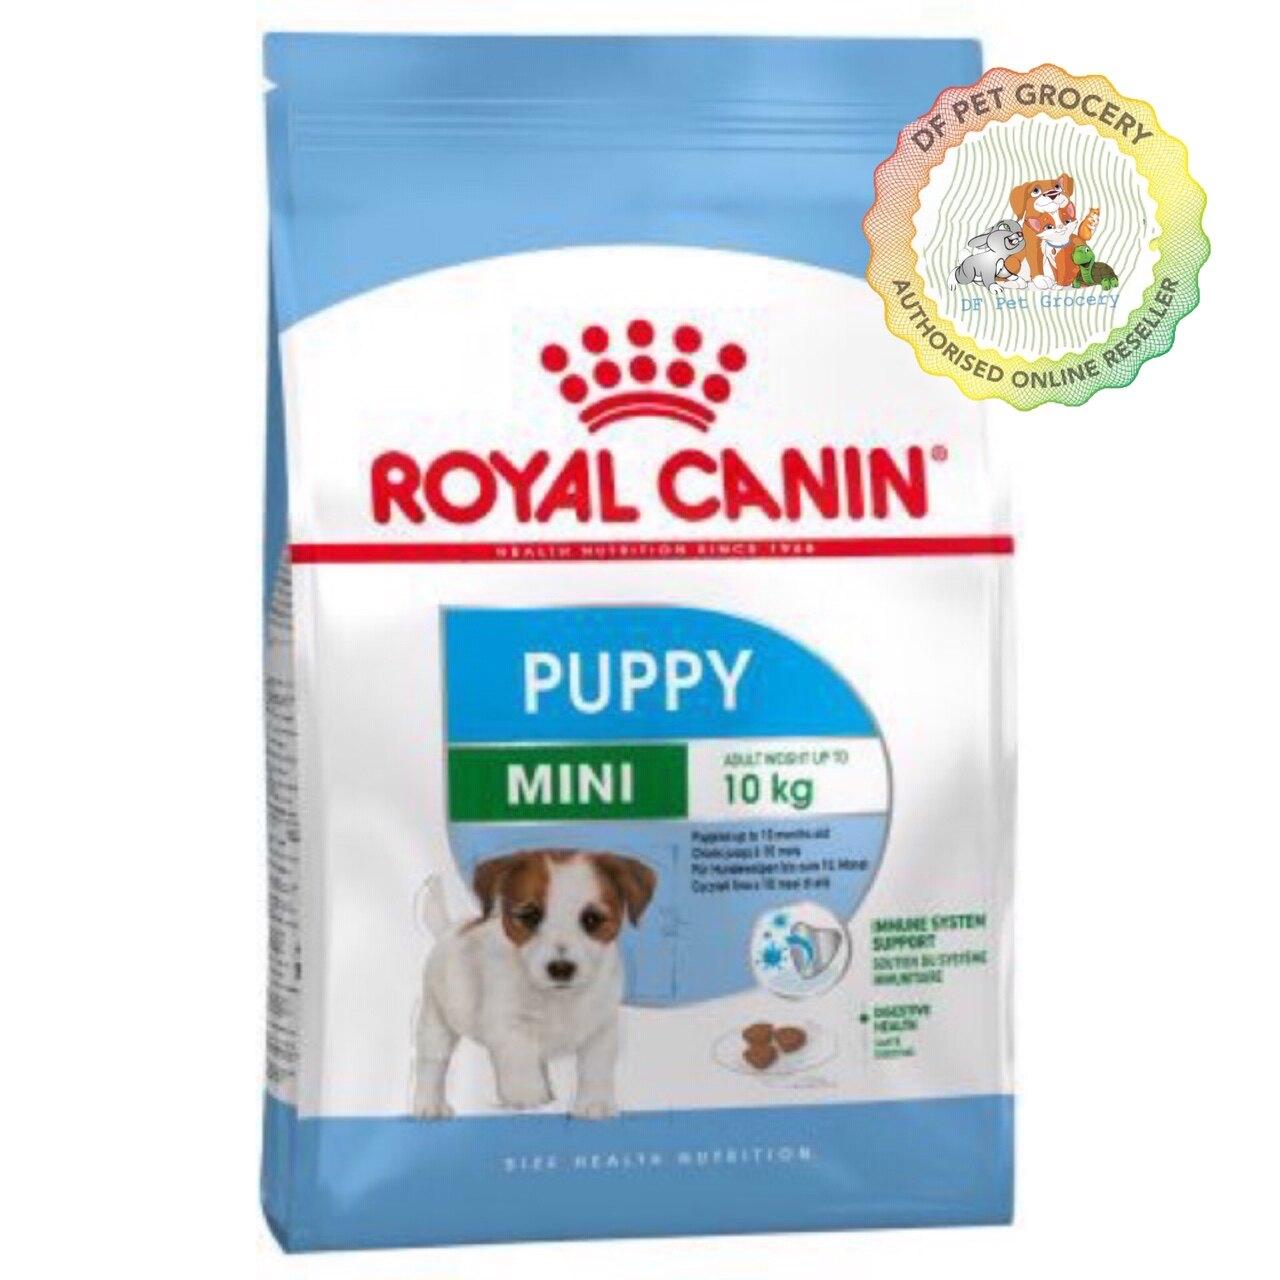 Royal Canin Mini Puppy 4kg - Royal Canin Puppy Food